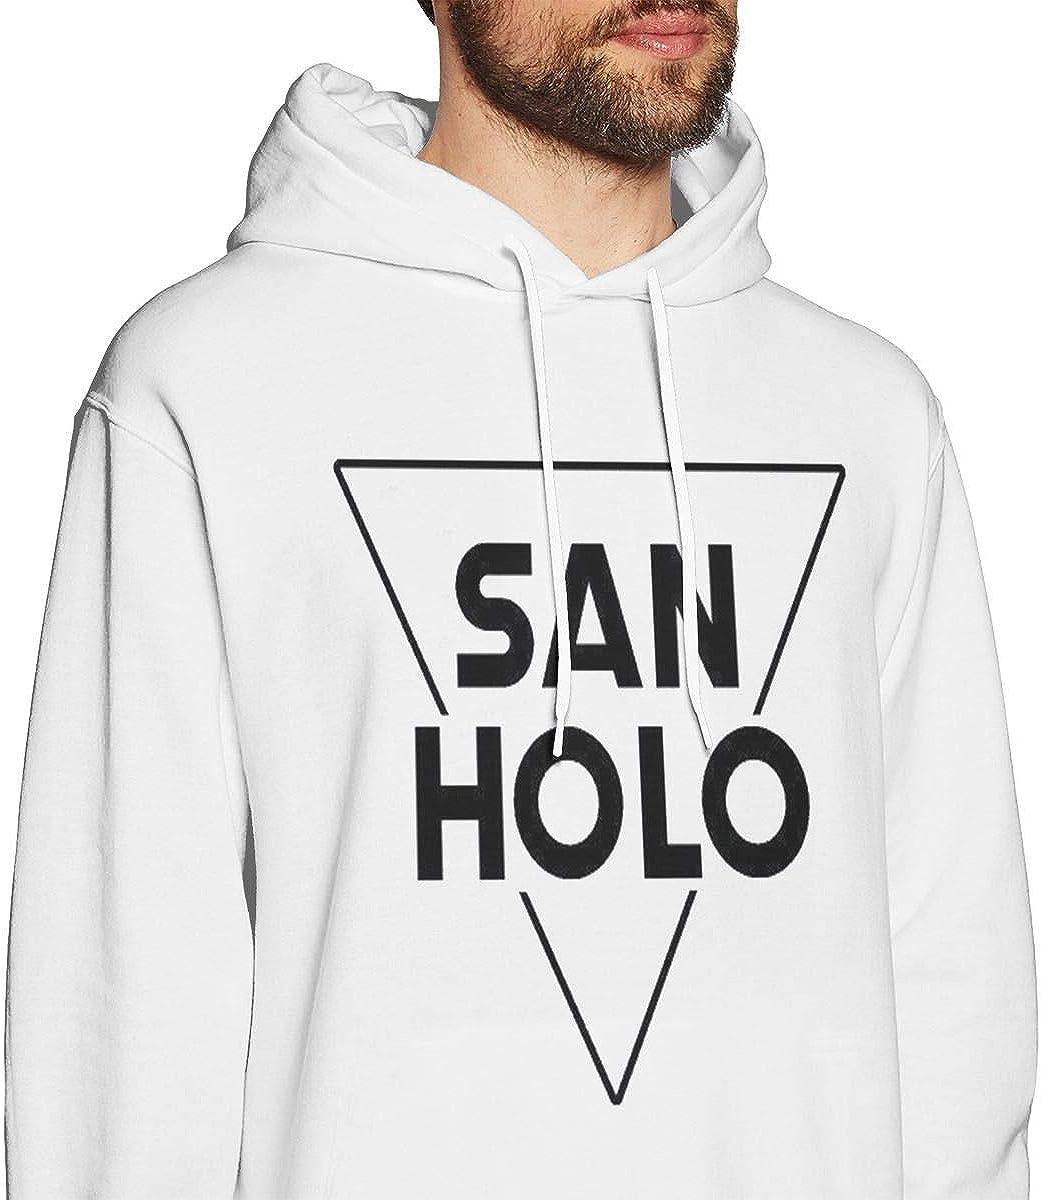 Mens Hooded Sweatshirt San Holo Personality Street Trend Creation White